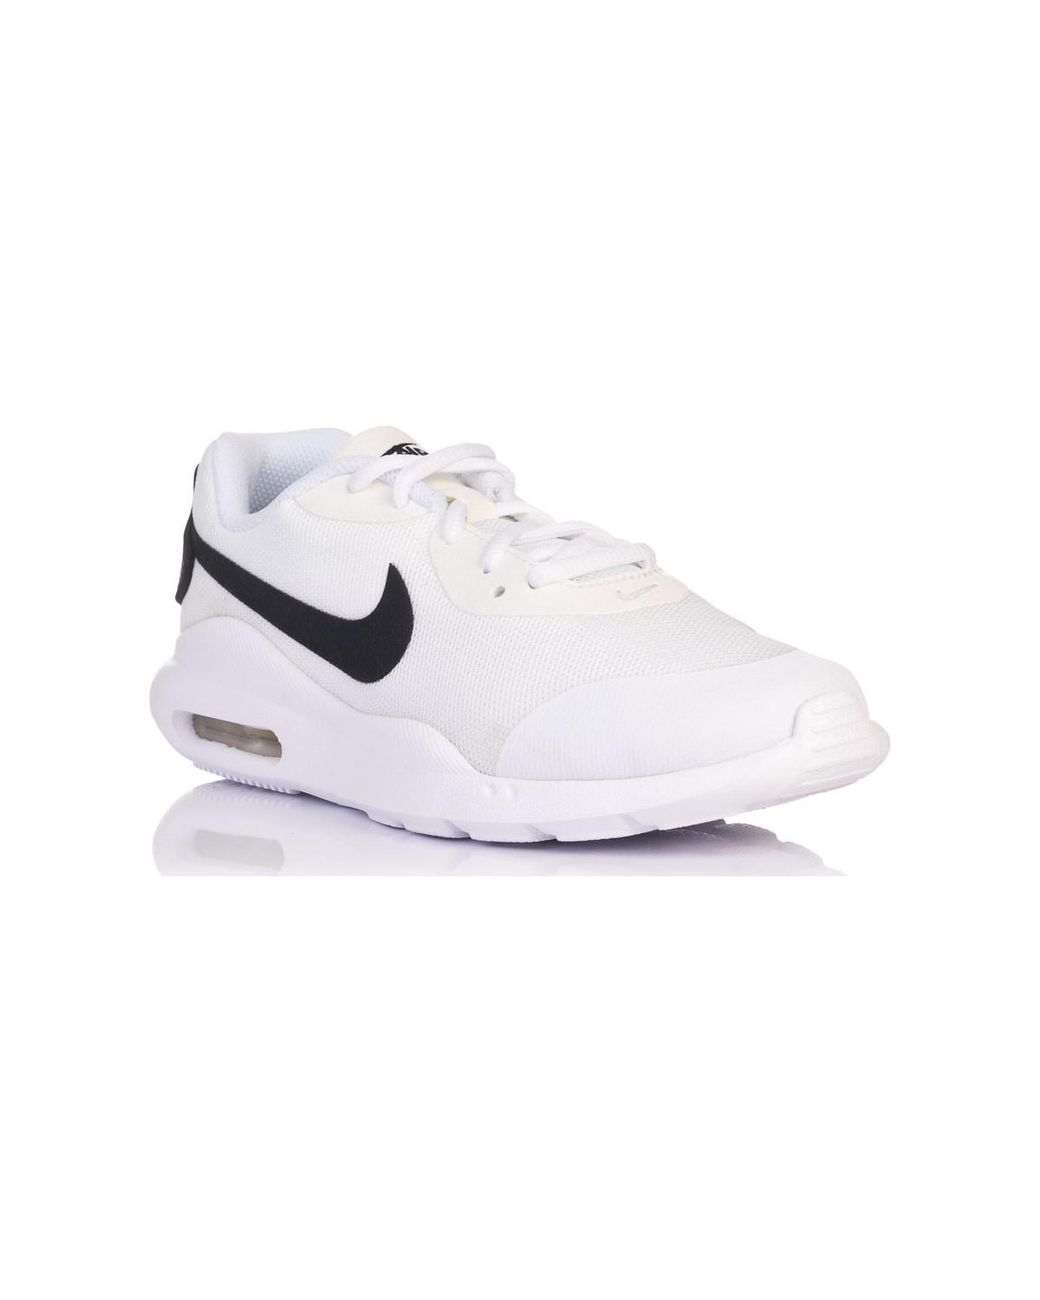 Femmes Coloris Gs Oketo En Blanc Nike Chaussures Air Max Lyst uOPZwXkiT